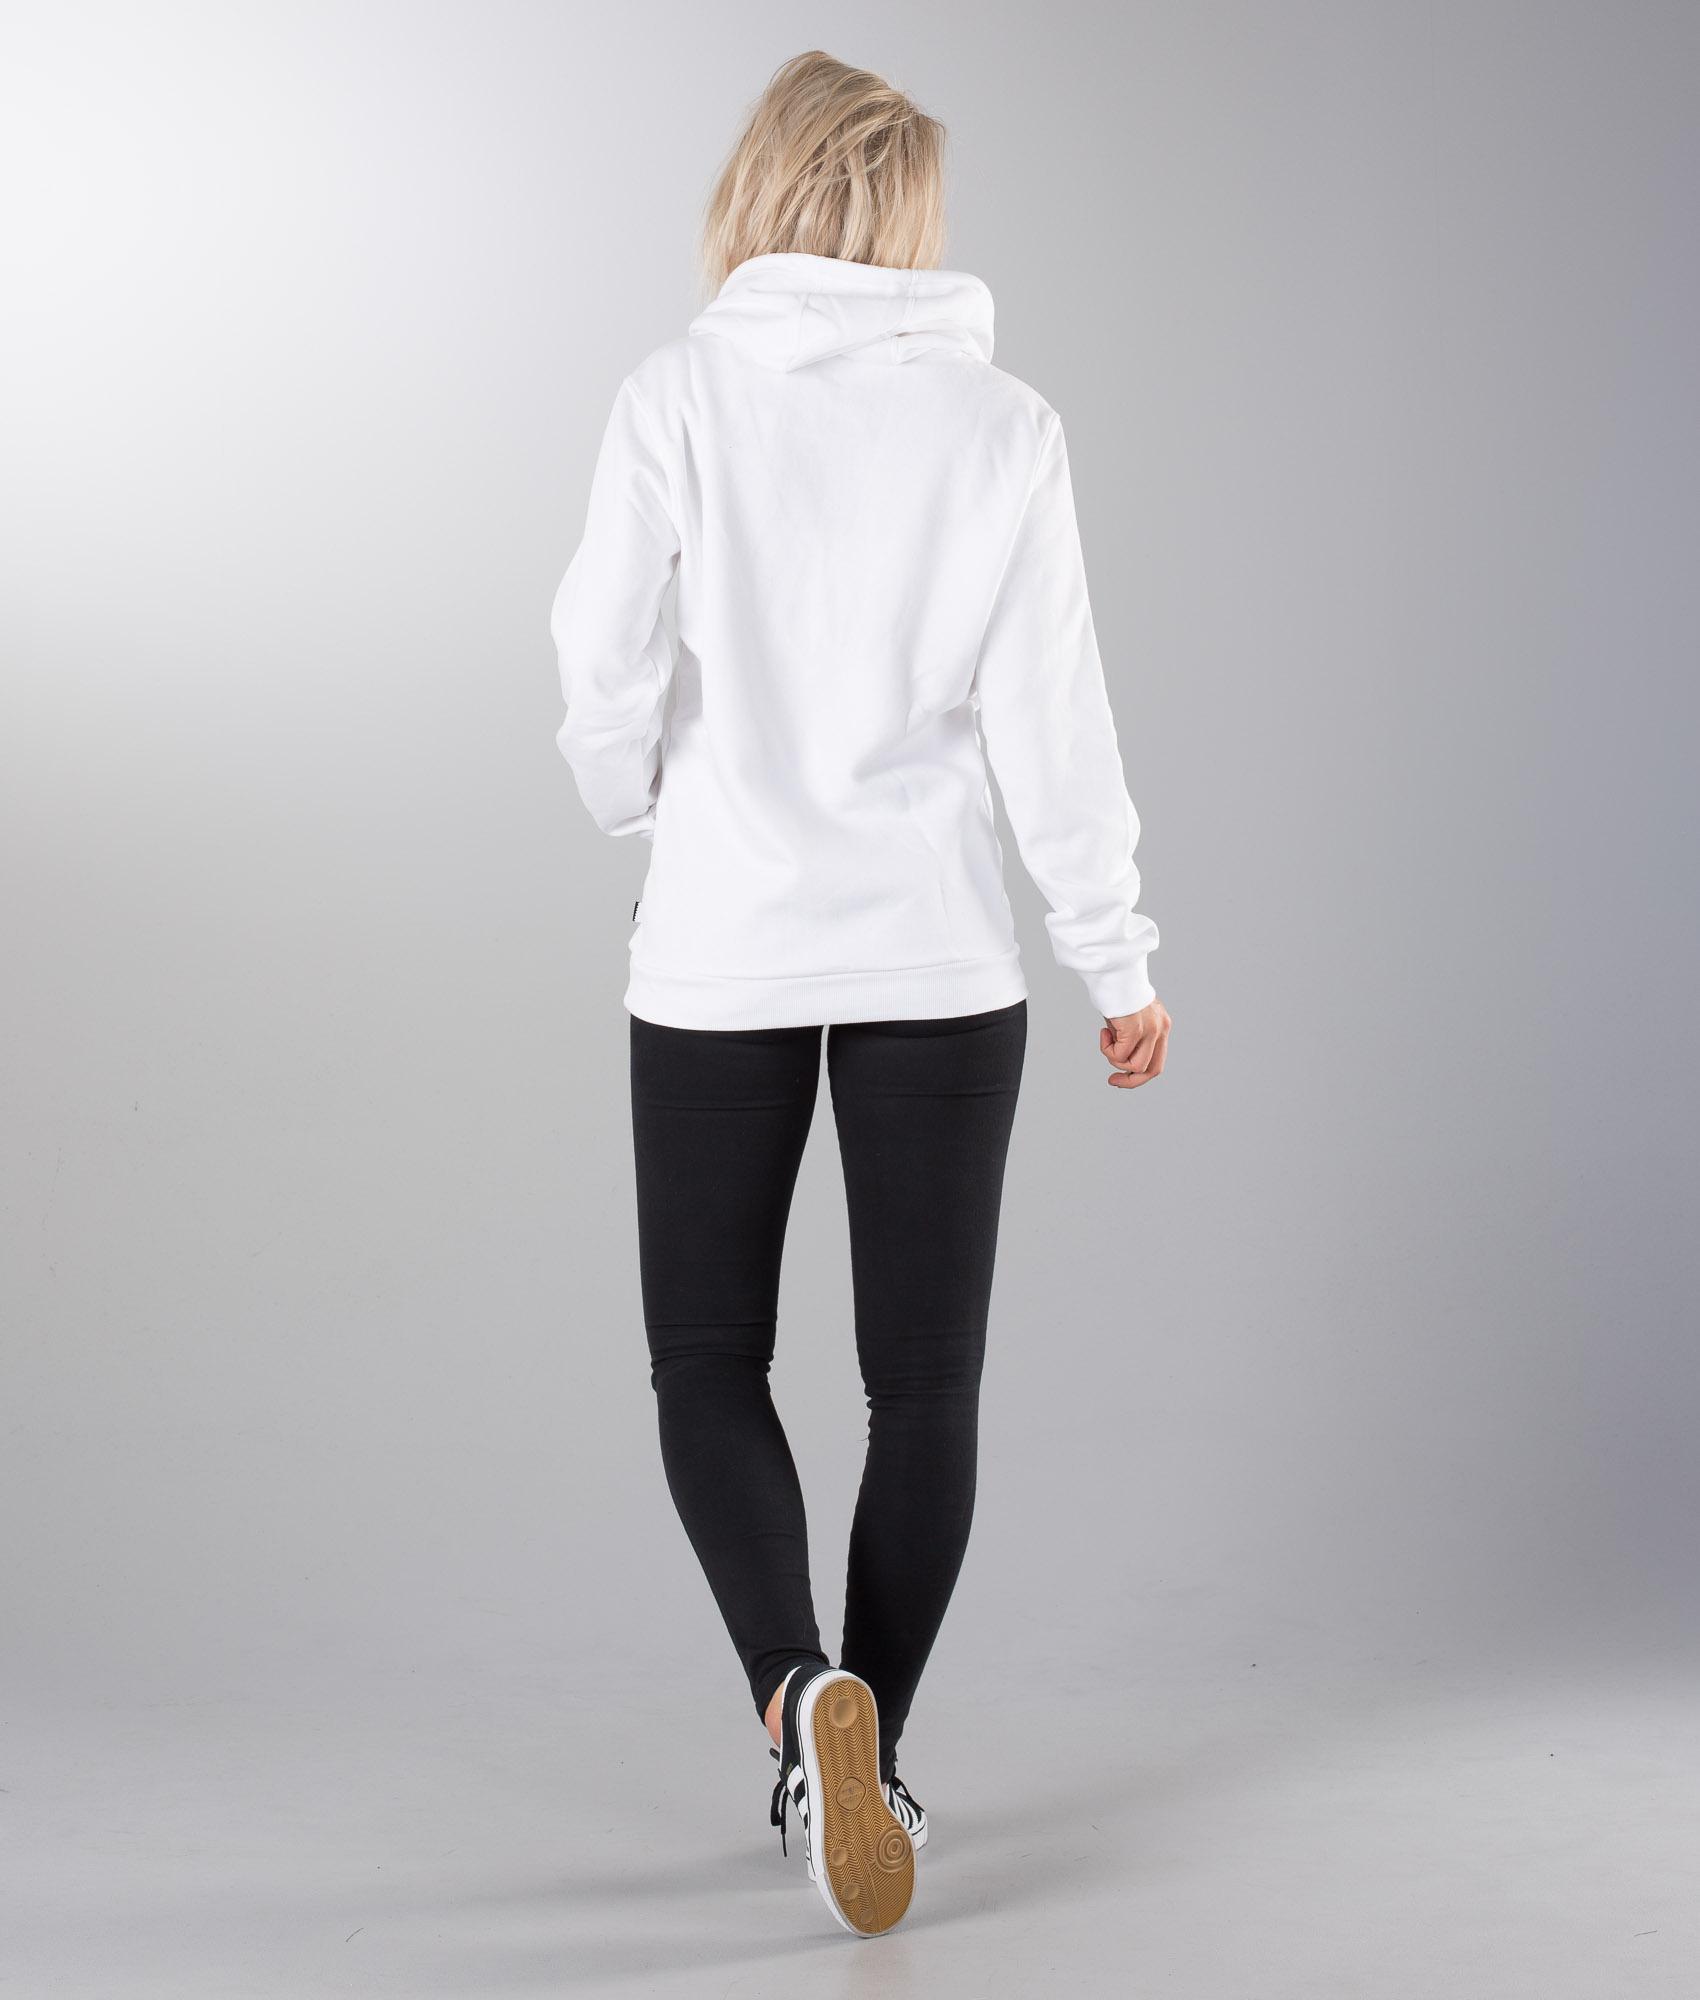 Adidas Skateboarding Spell Out Hd Unisex Capucha WhiteBlack